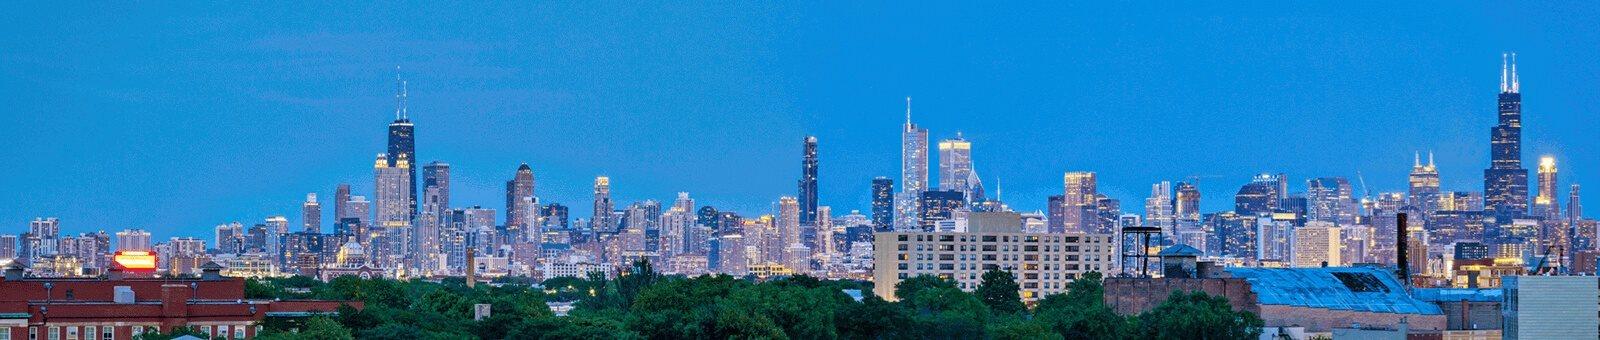 Panoramic View Of City at Noca Blu, Illinois